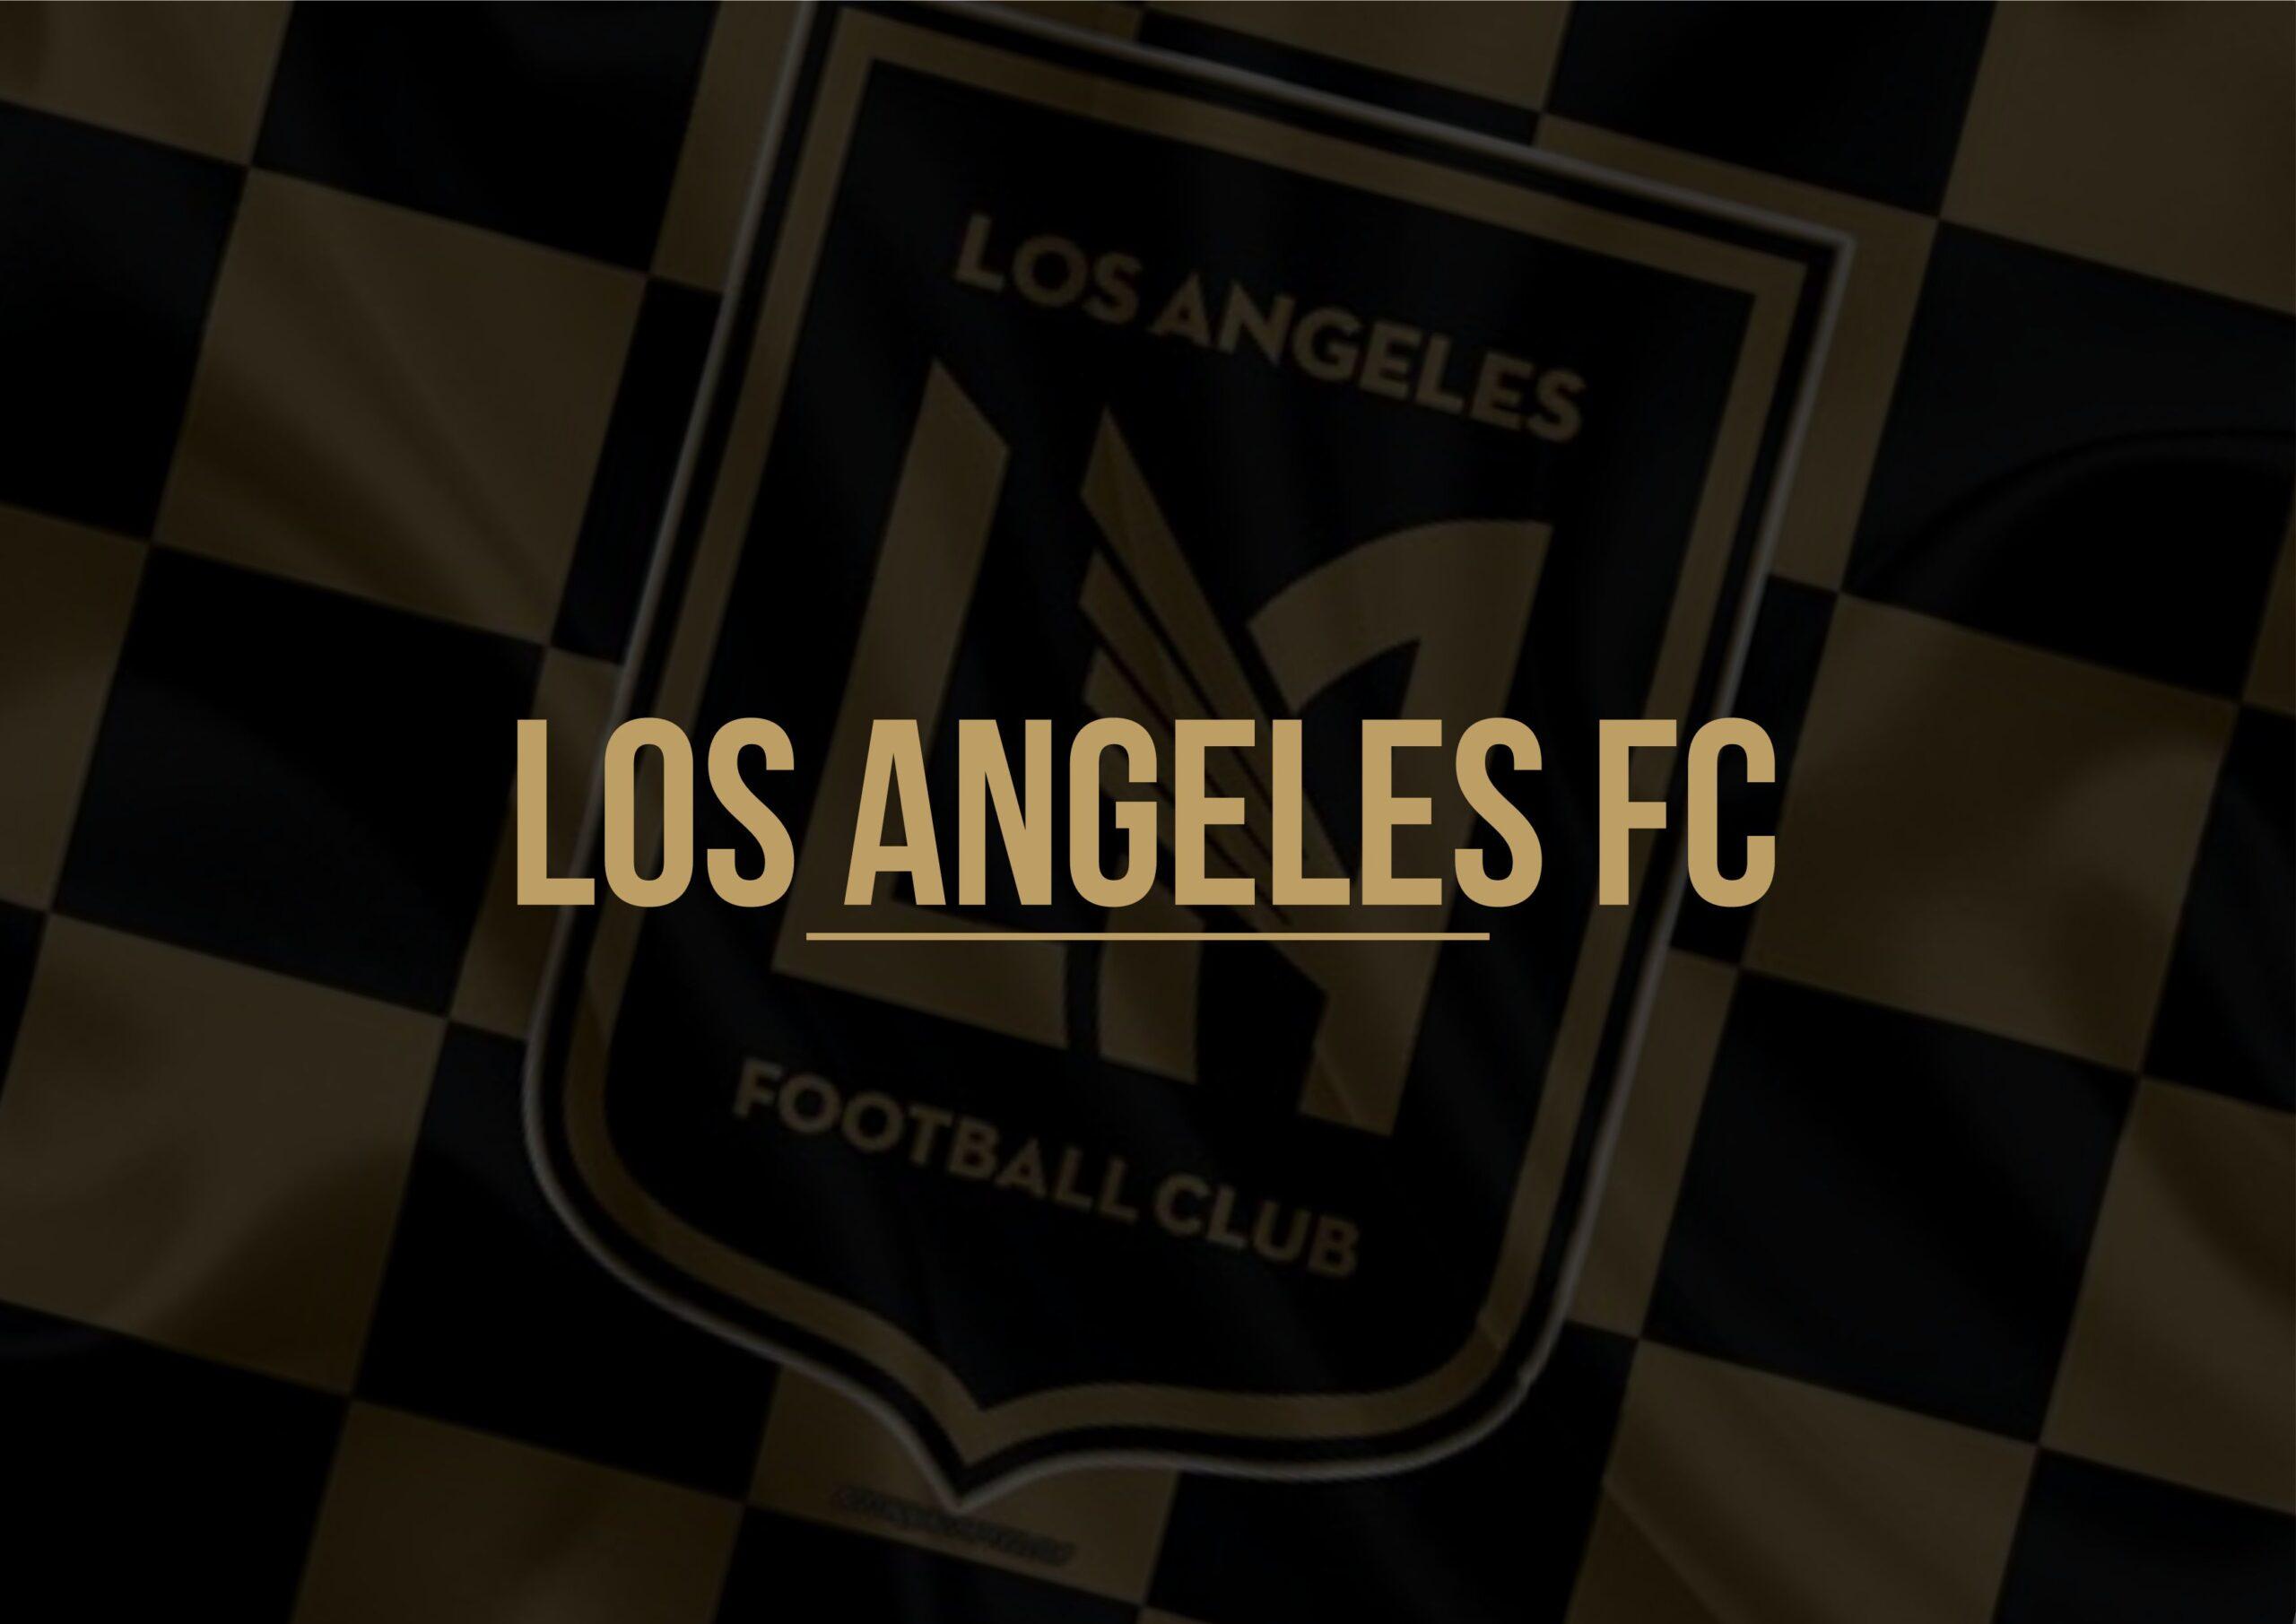 Los Angeles FC | MLS Magazine Italia